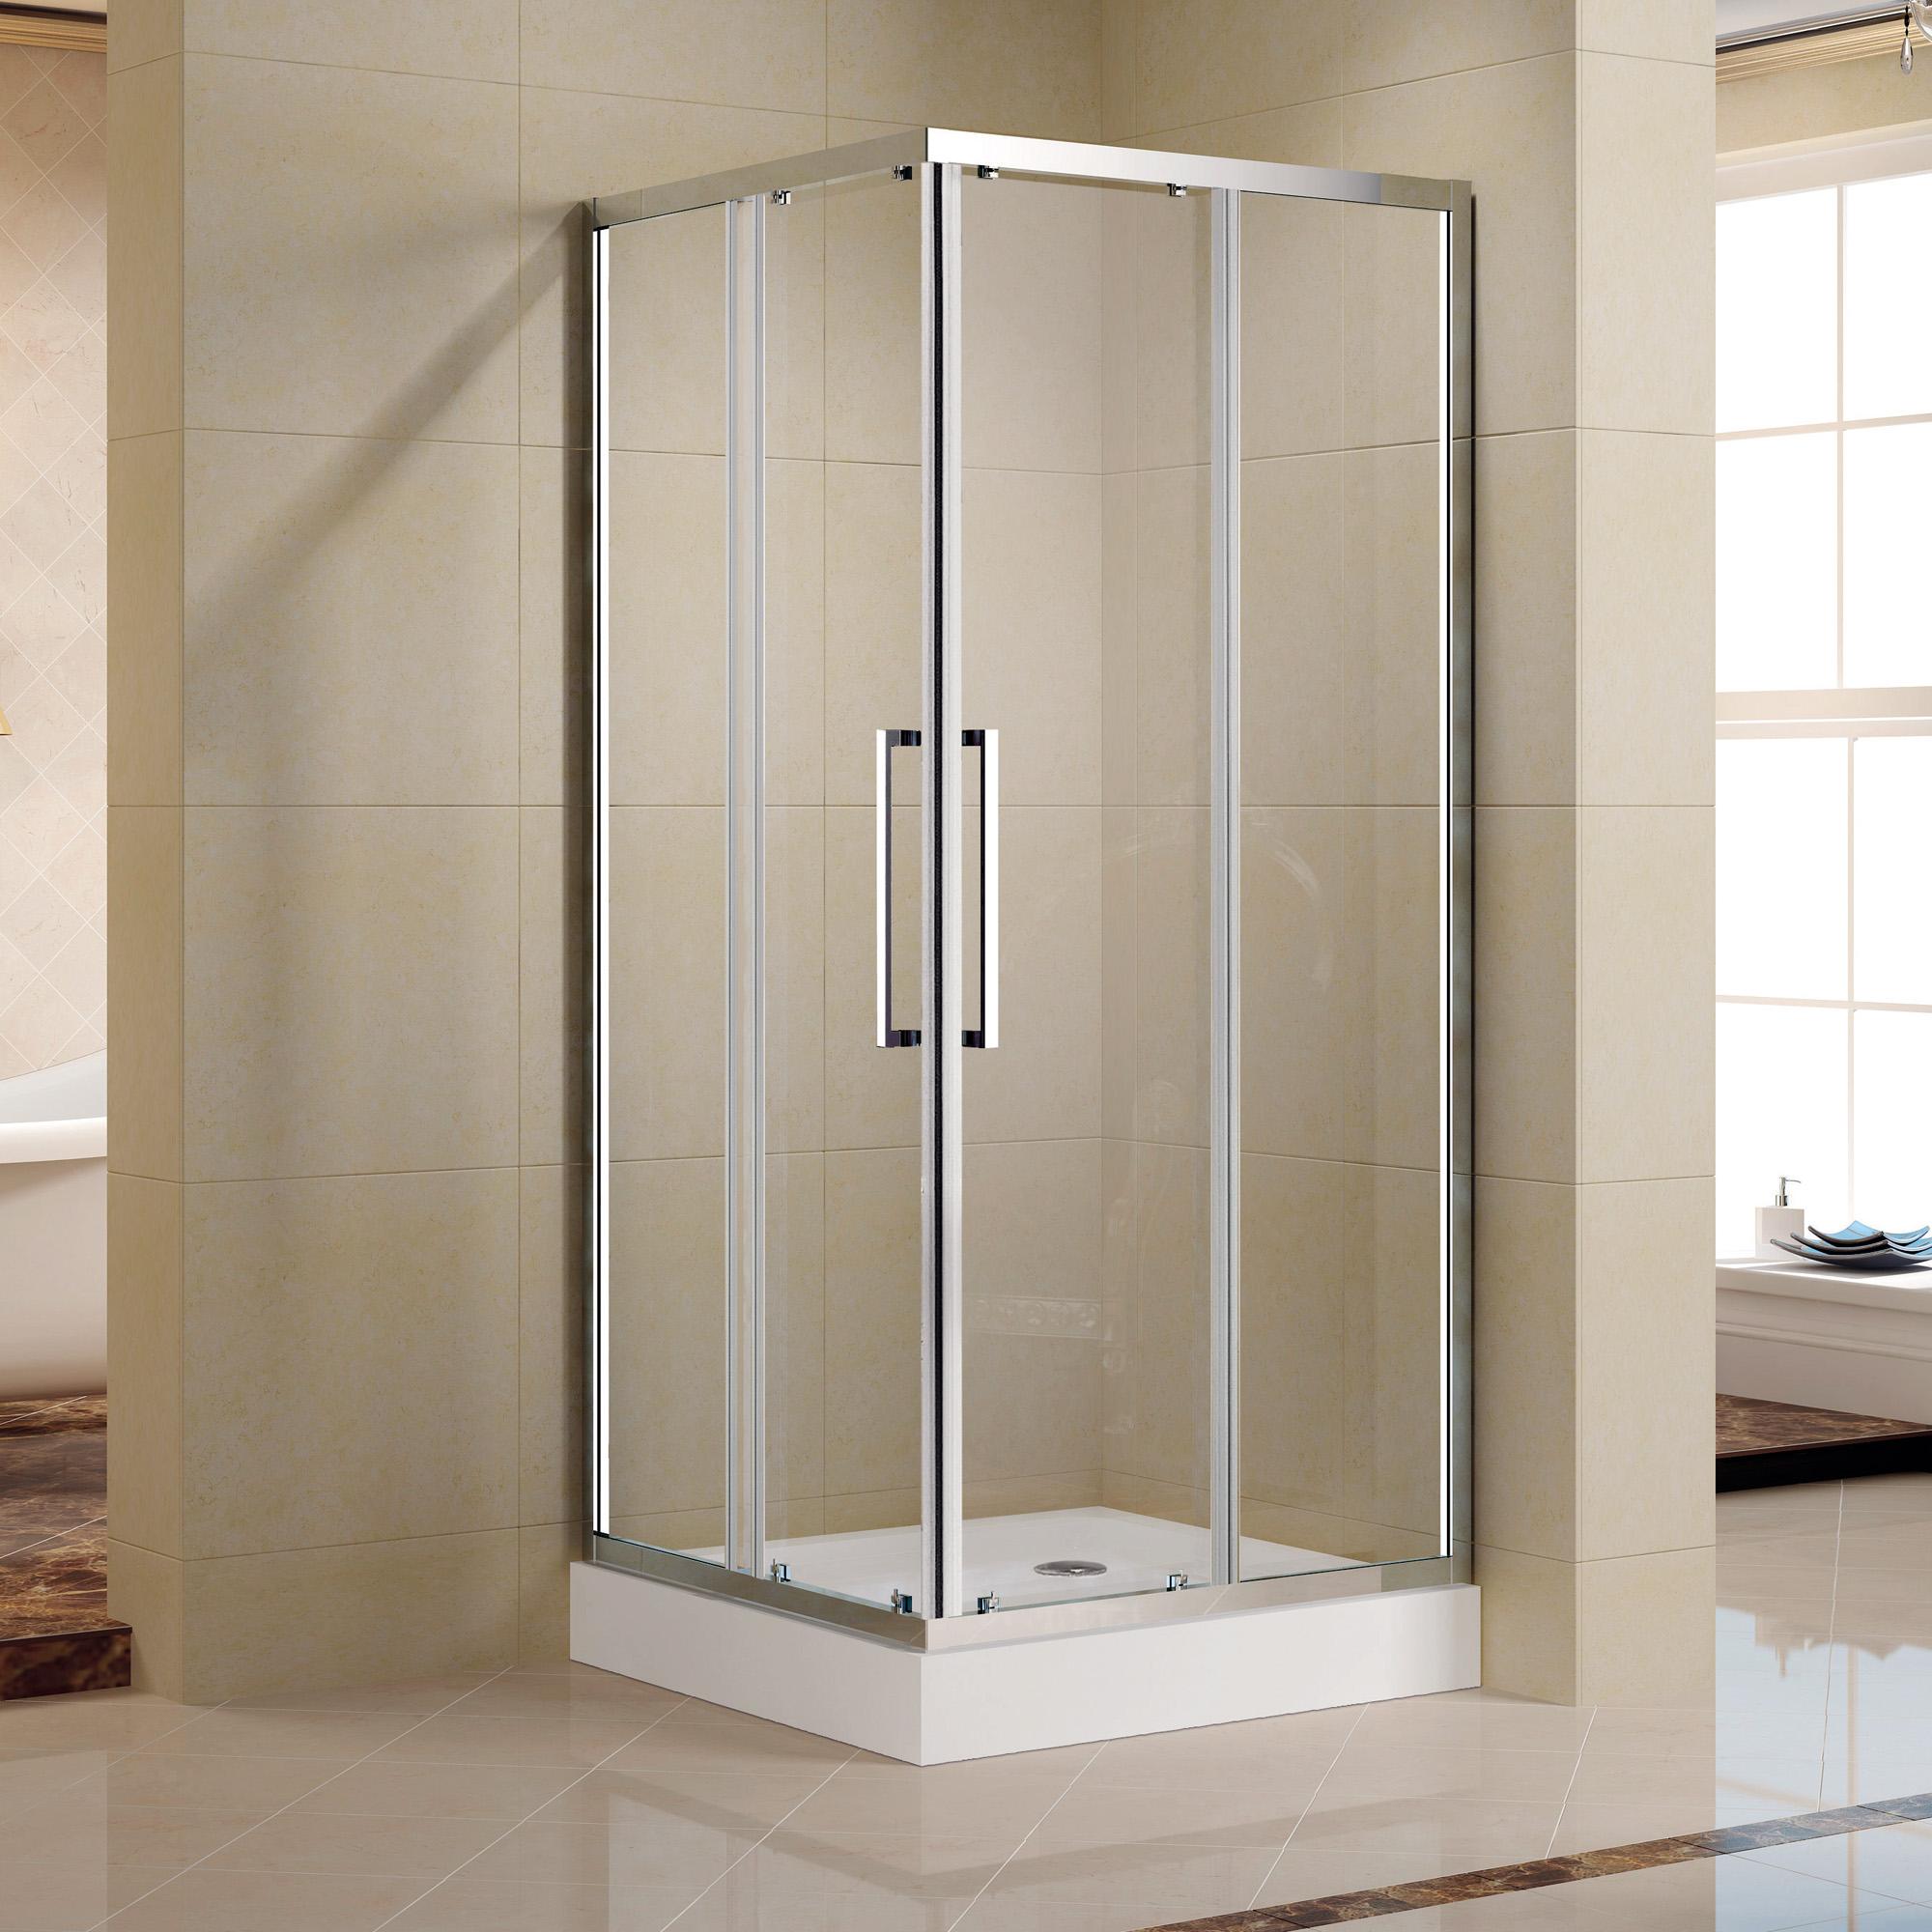 Semi Framed Bathroom Shower Sliding Glass Door Corner Kit Enclosure